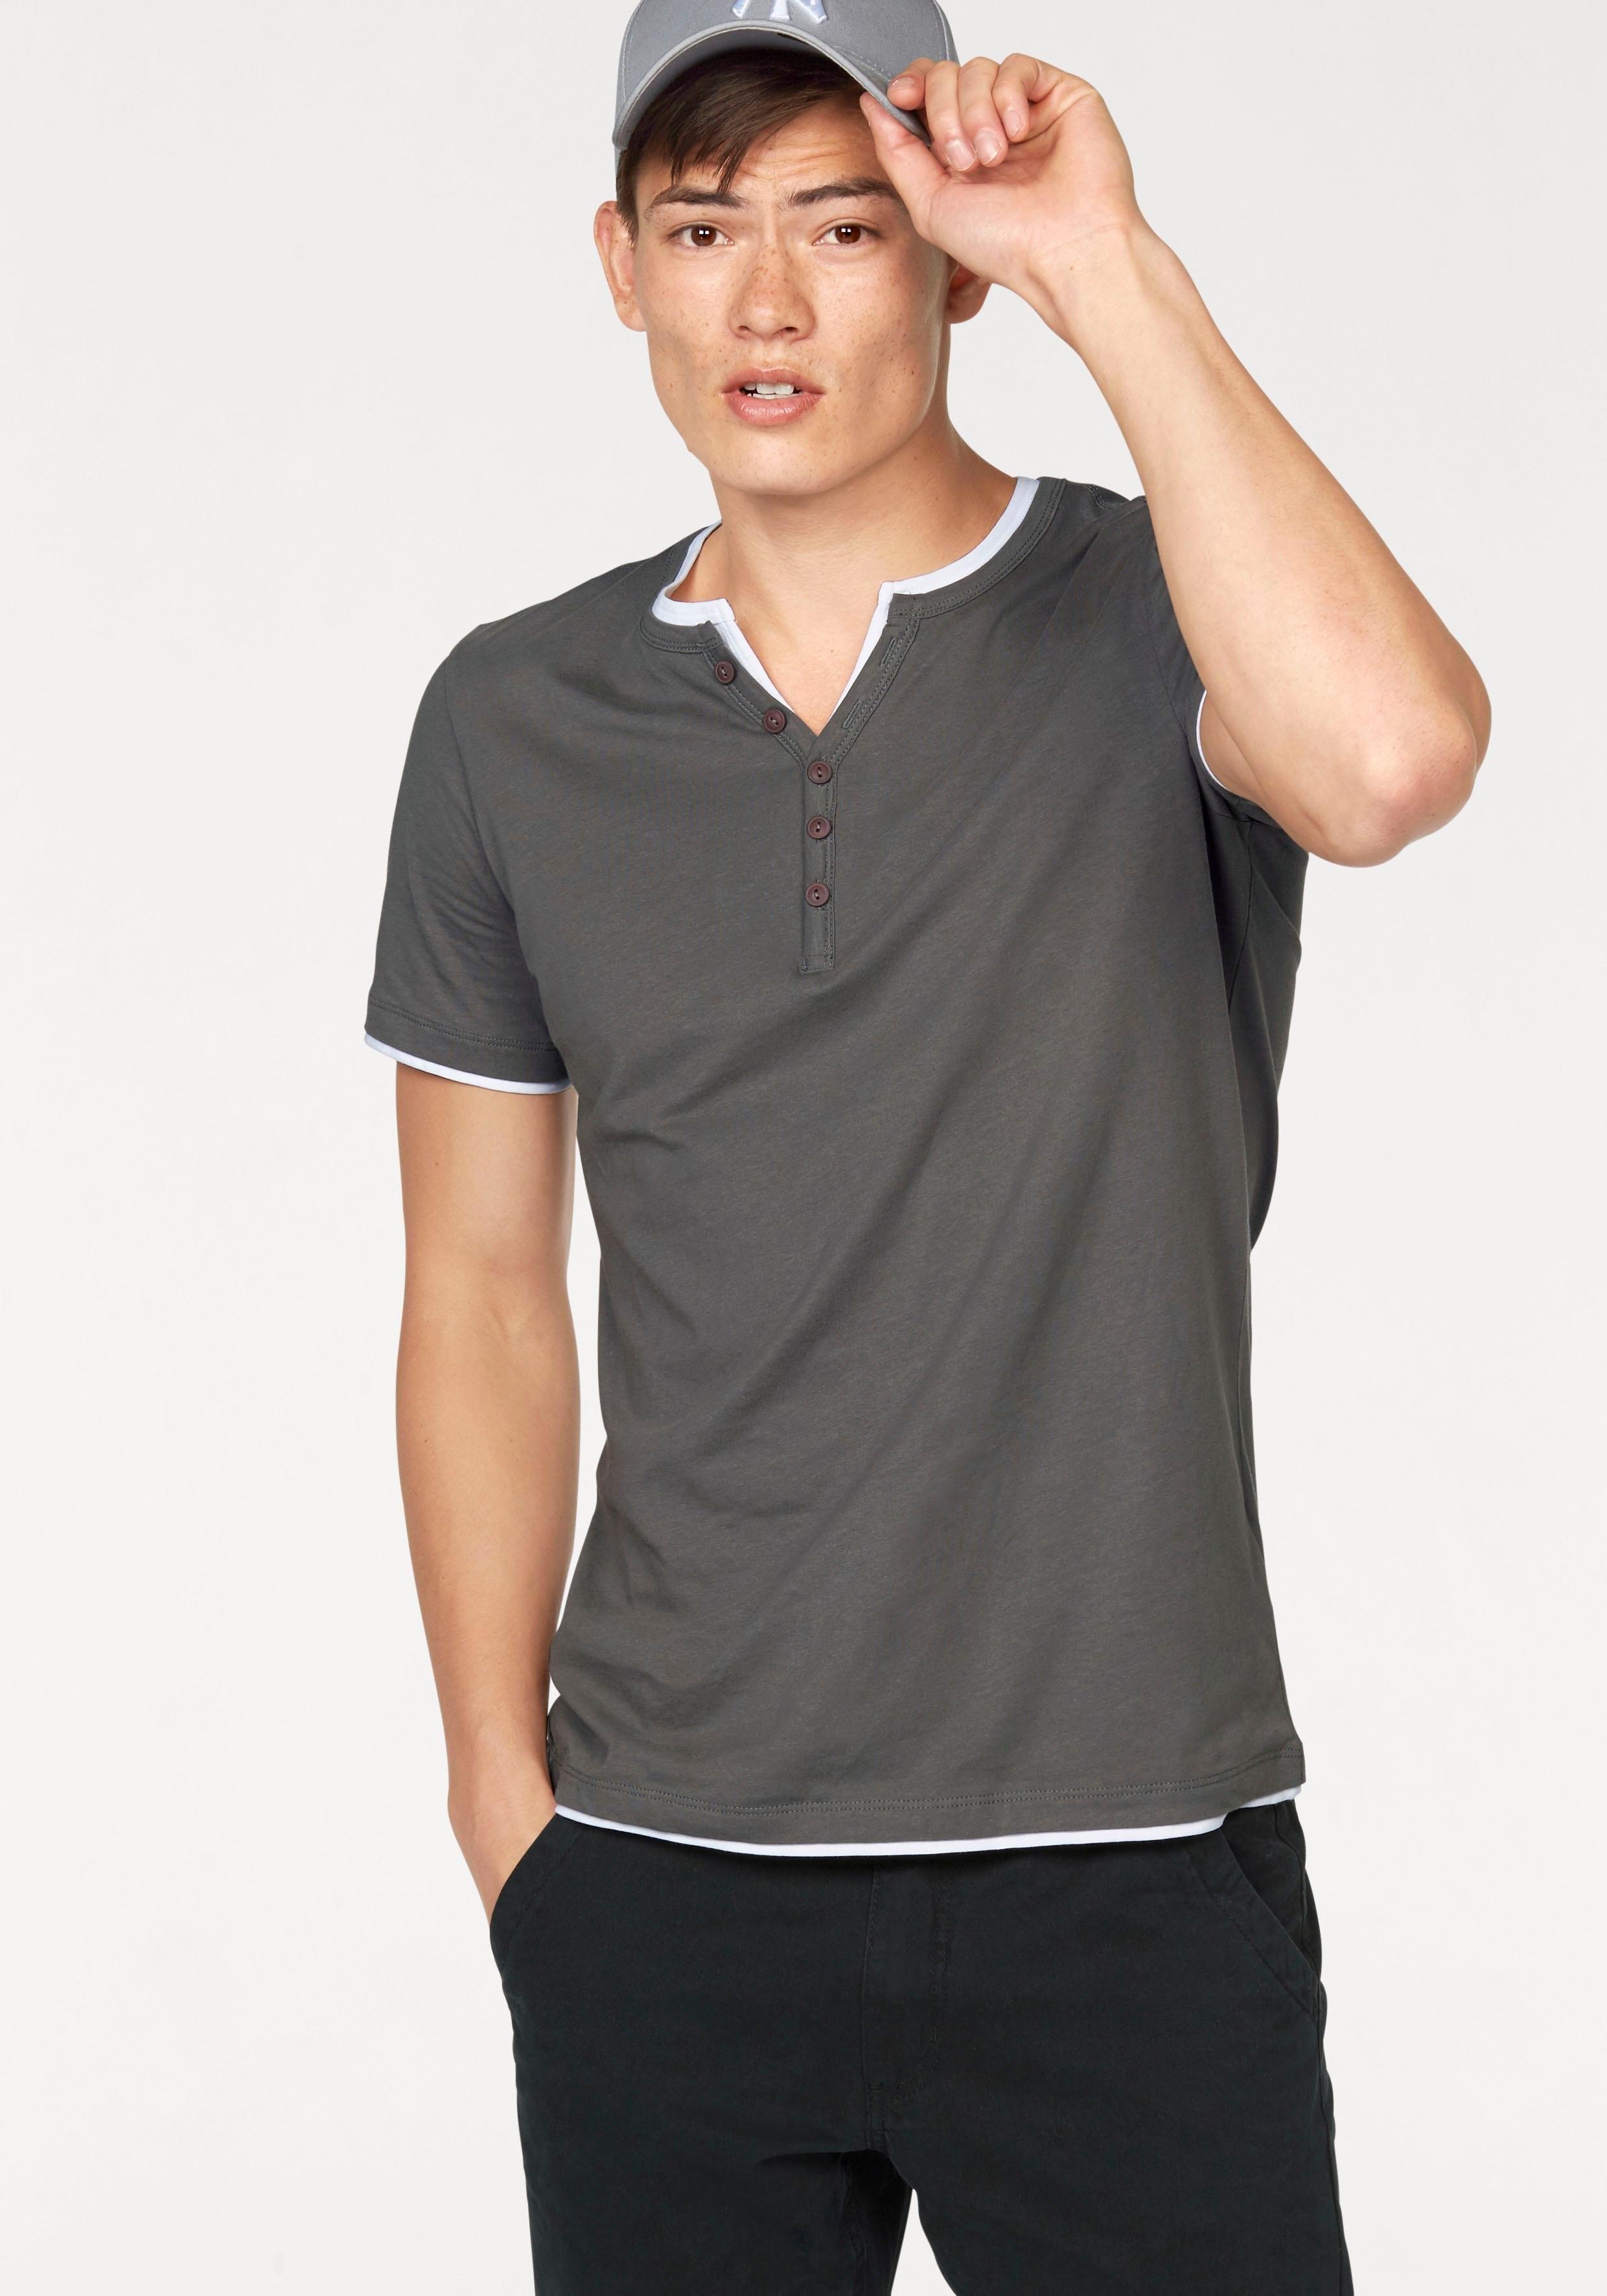 John Devin Shirt in layer-look en smal model online kopen op otto.nl